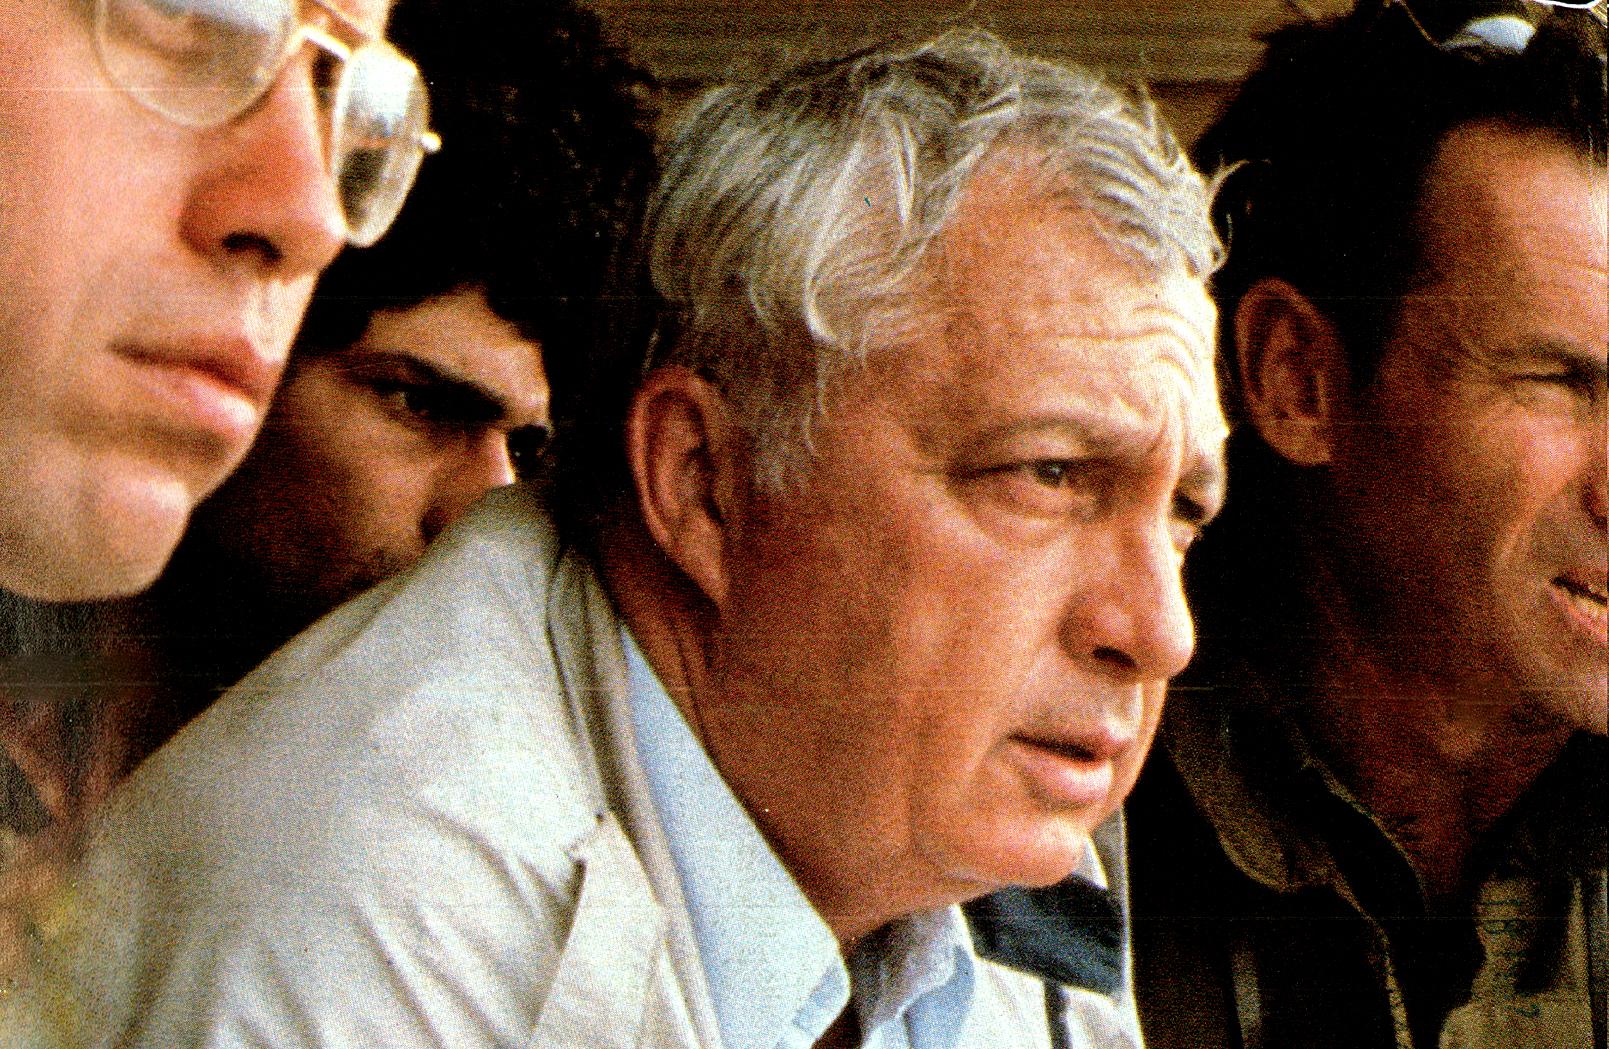 Ariel Sharon - Lebanon Situation - September 1982